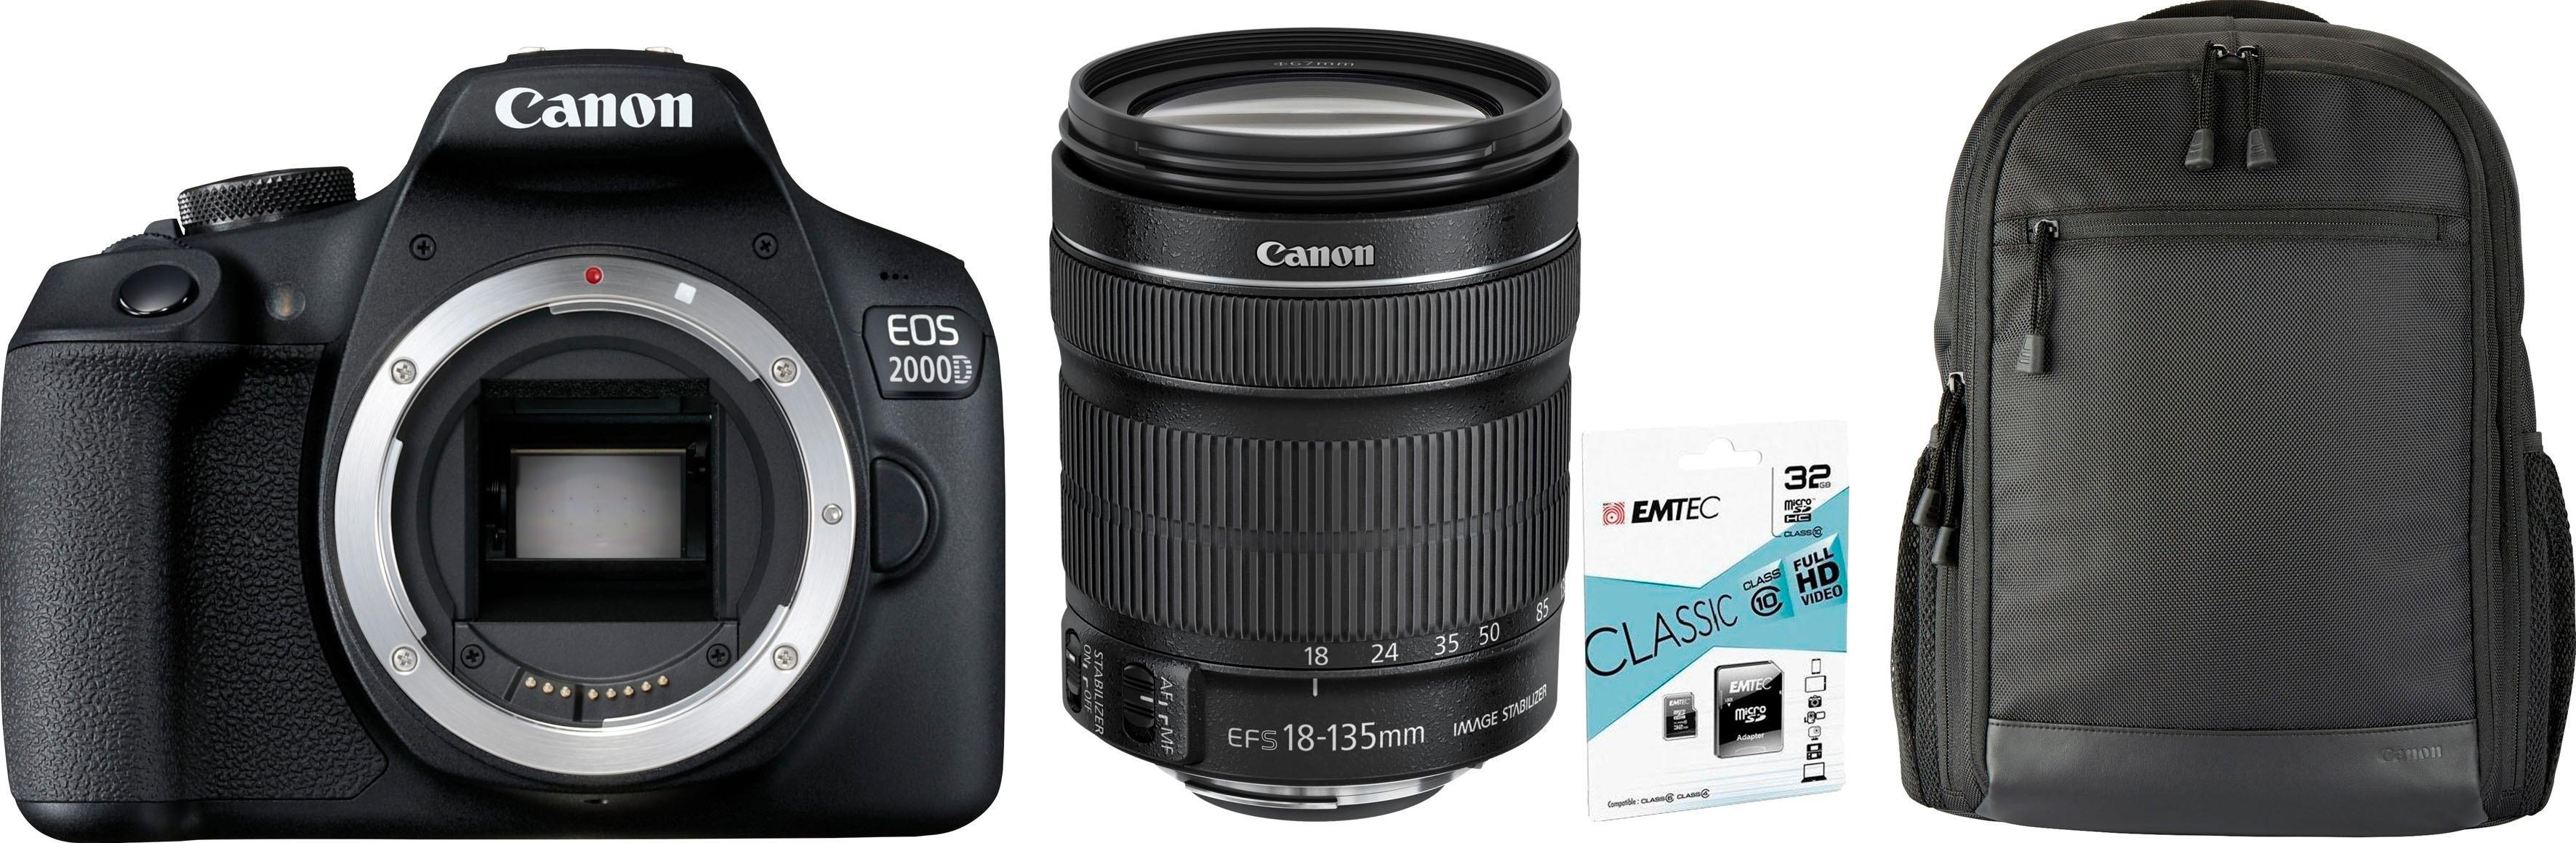 Canon »EOS 2000D EF-S18-135 Kit« spiegelreflexcamera (EF-S 18-135mm 1:3,5-5,6 IS STM, 24,1 MP) - gratis ruilen op otto.nl